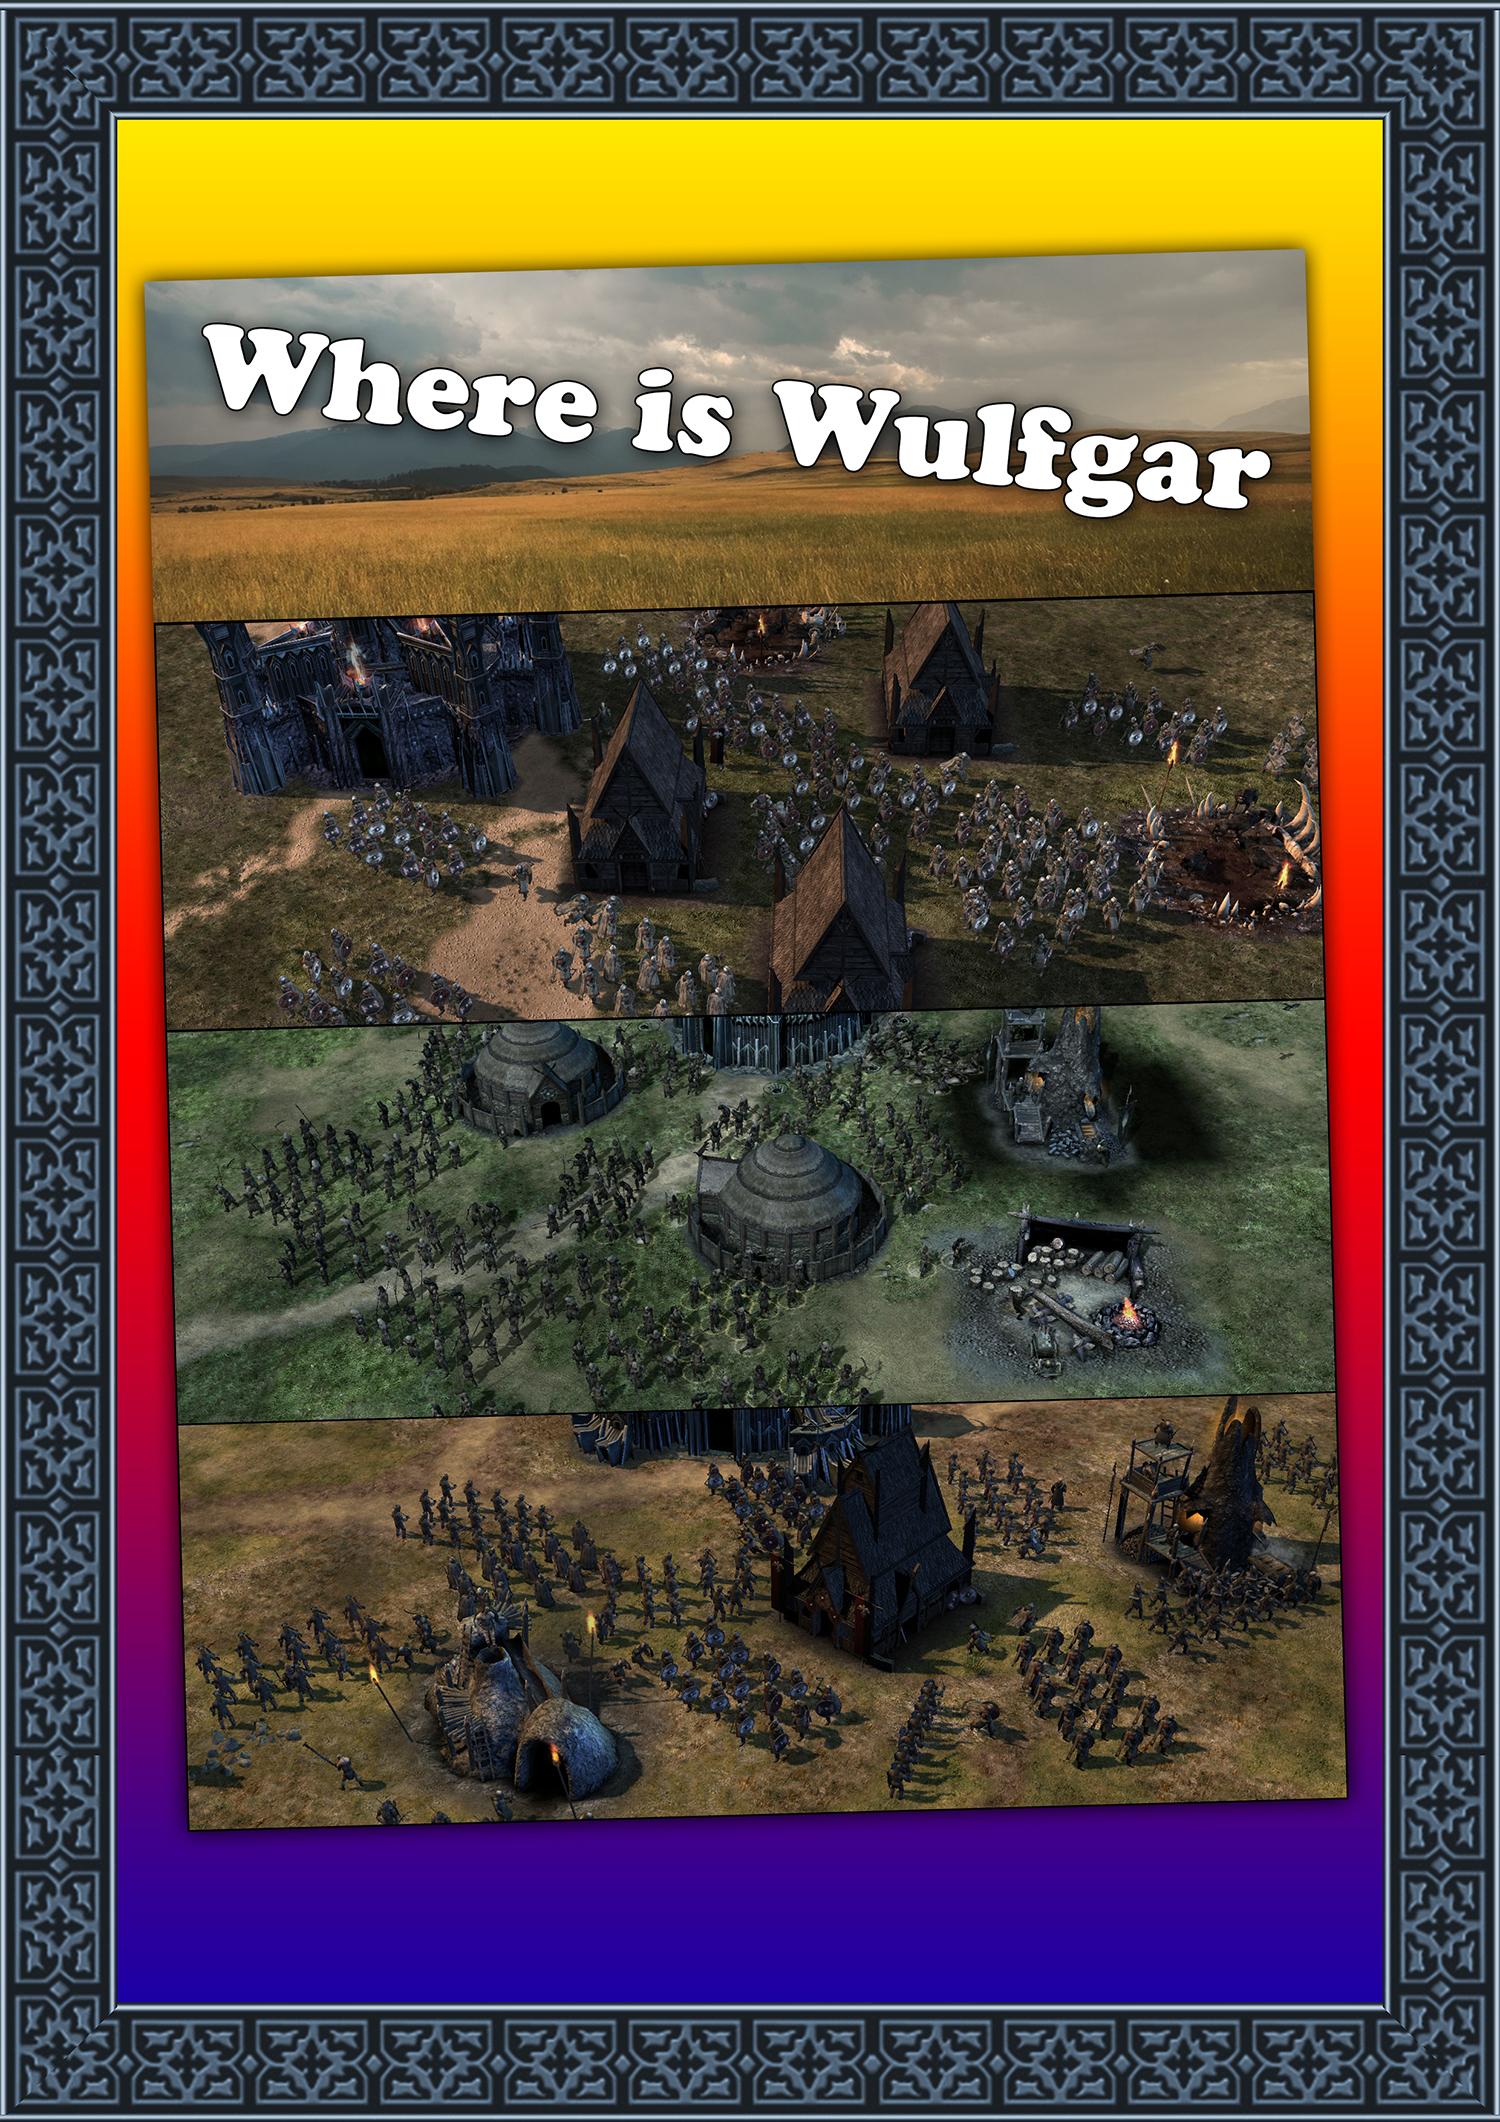 whereiswulfgar